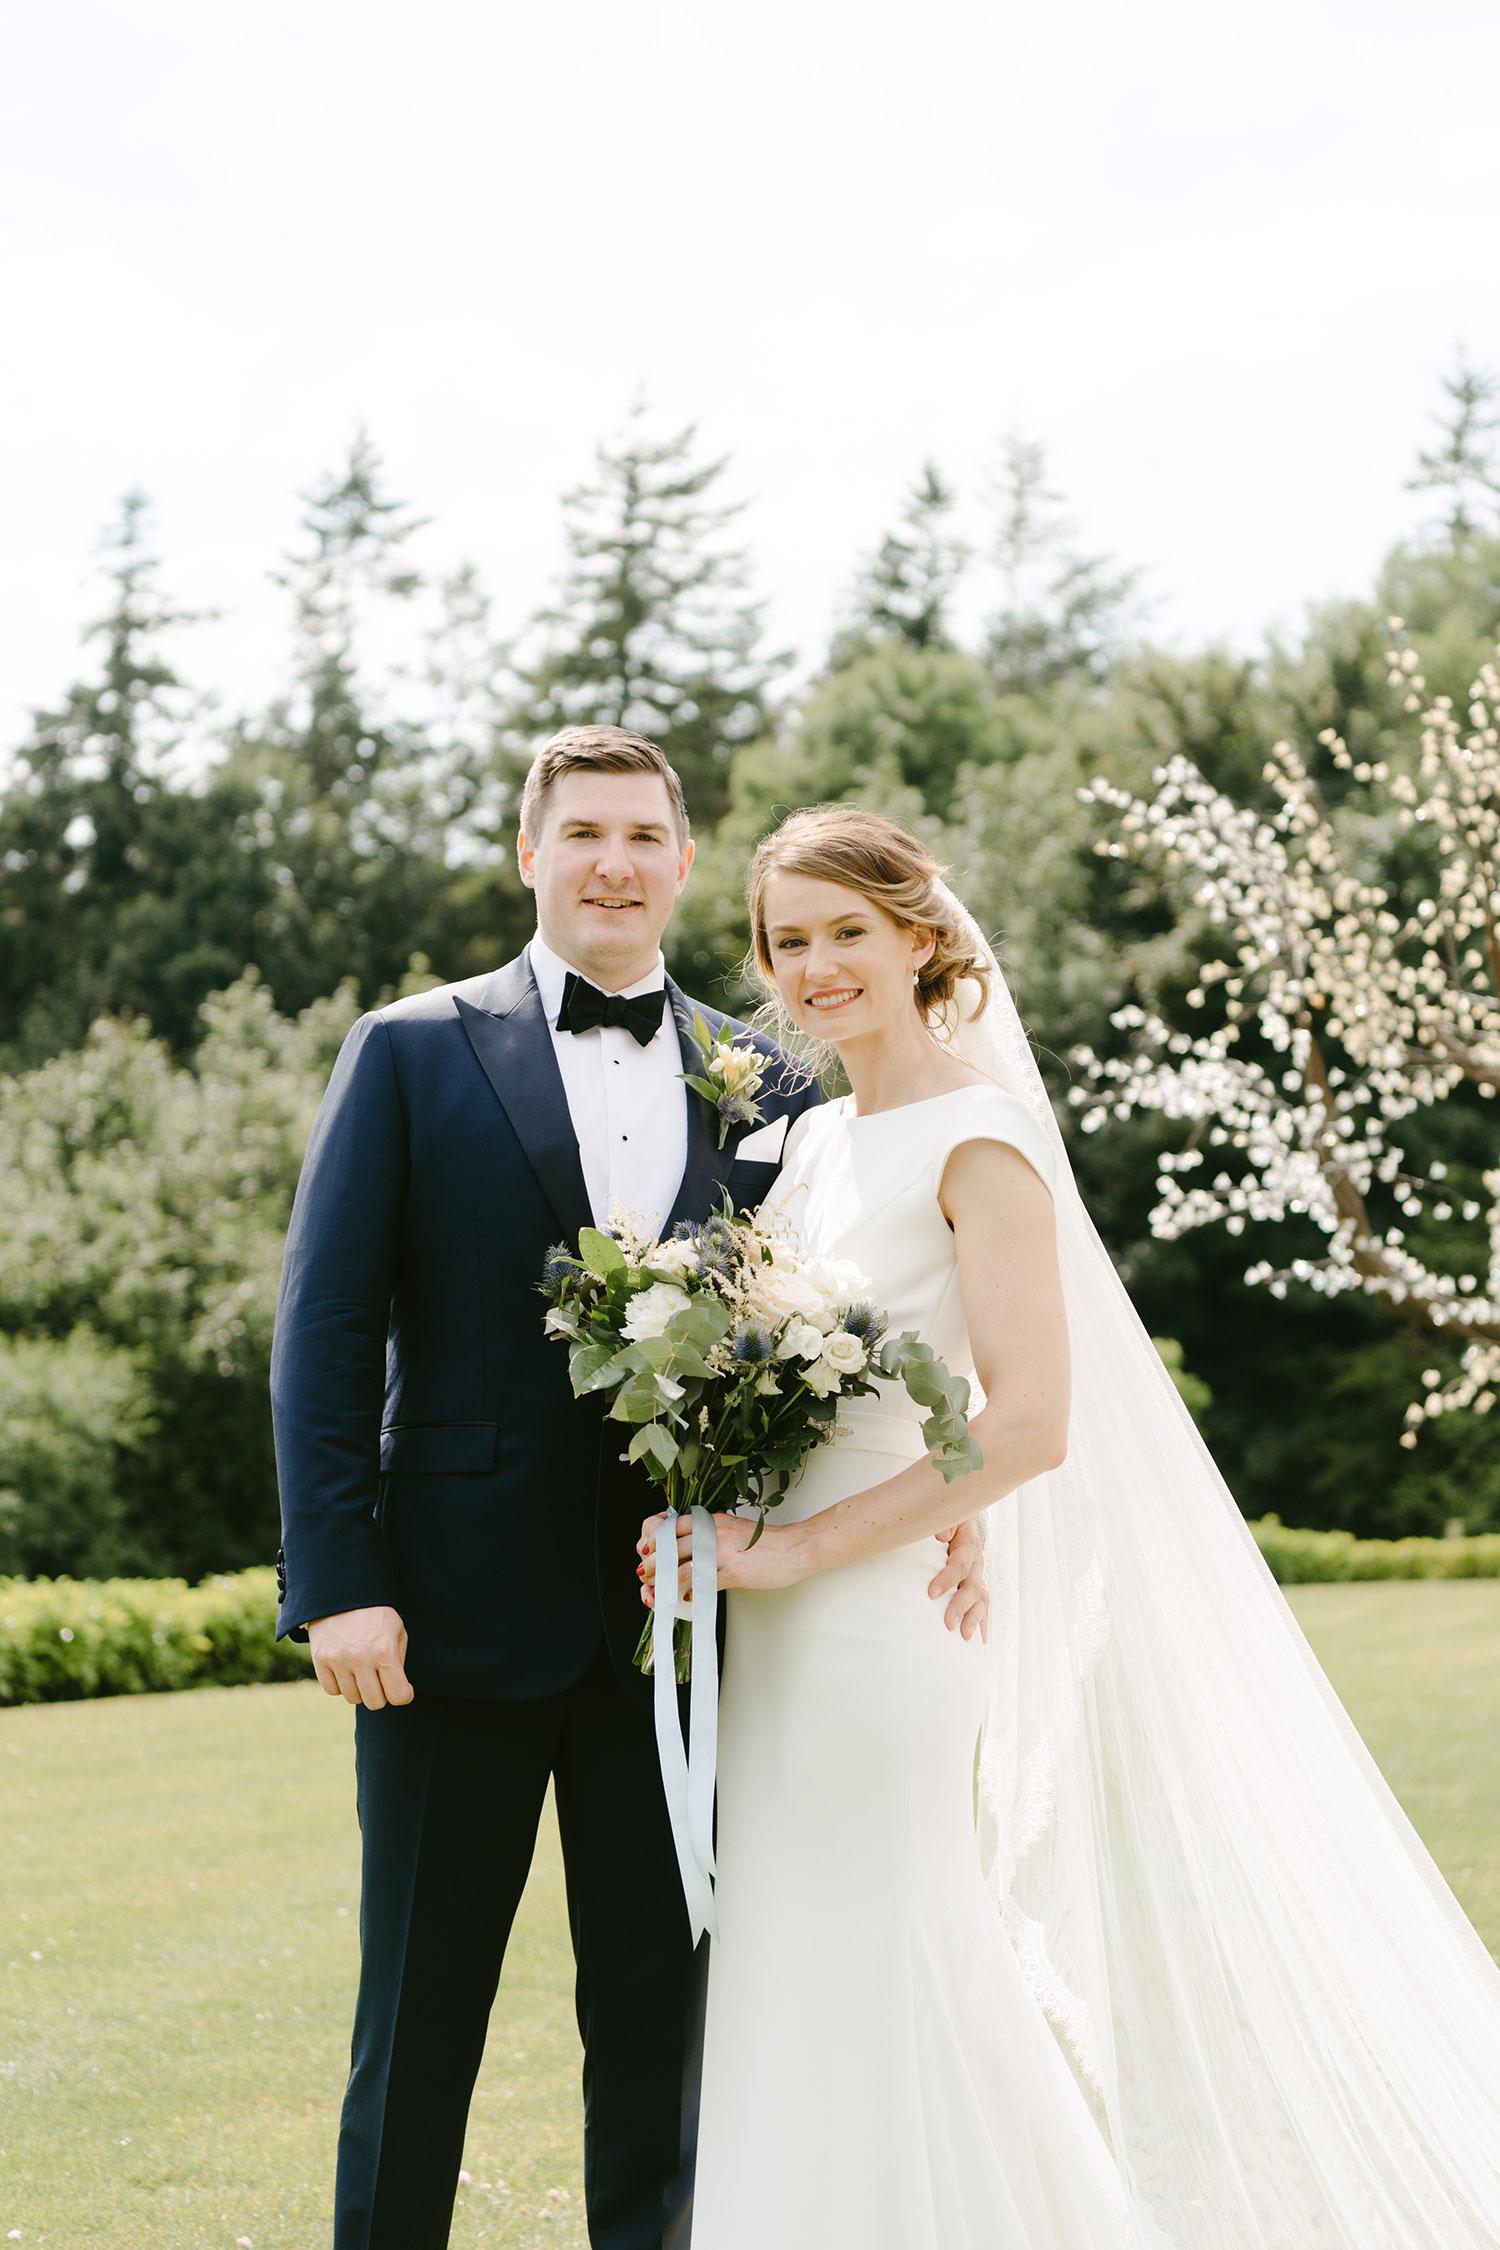 the-lodge-at-ashford-castle-wedding-photography-0096_1017.jpg